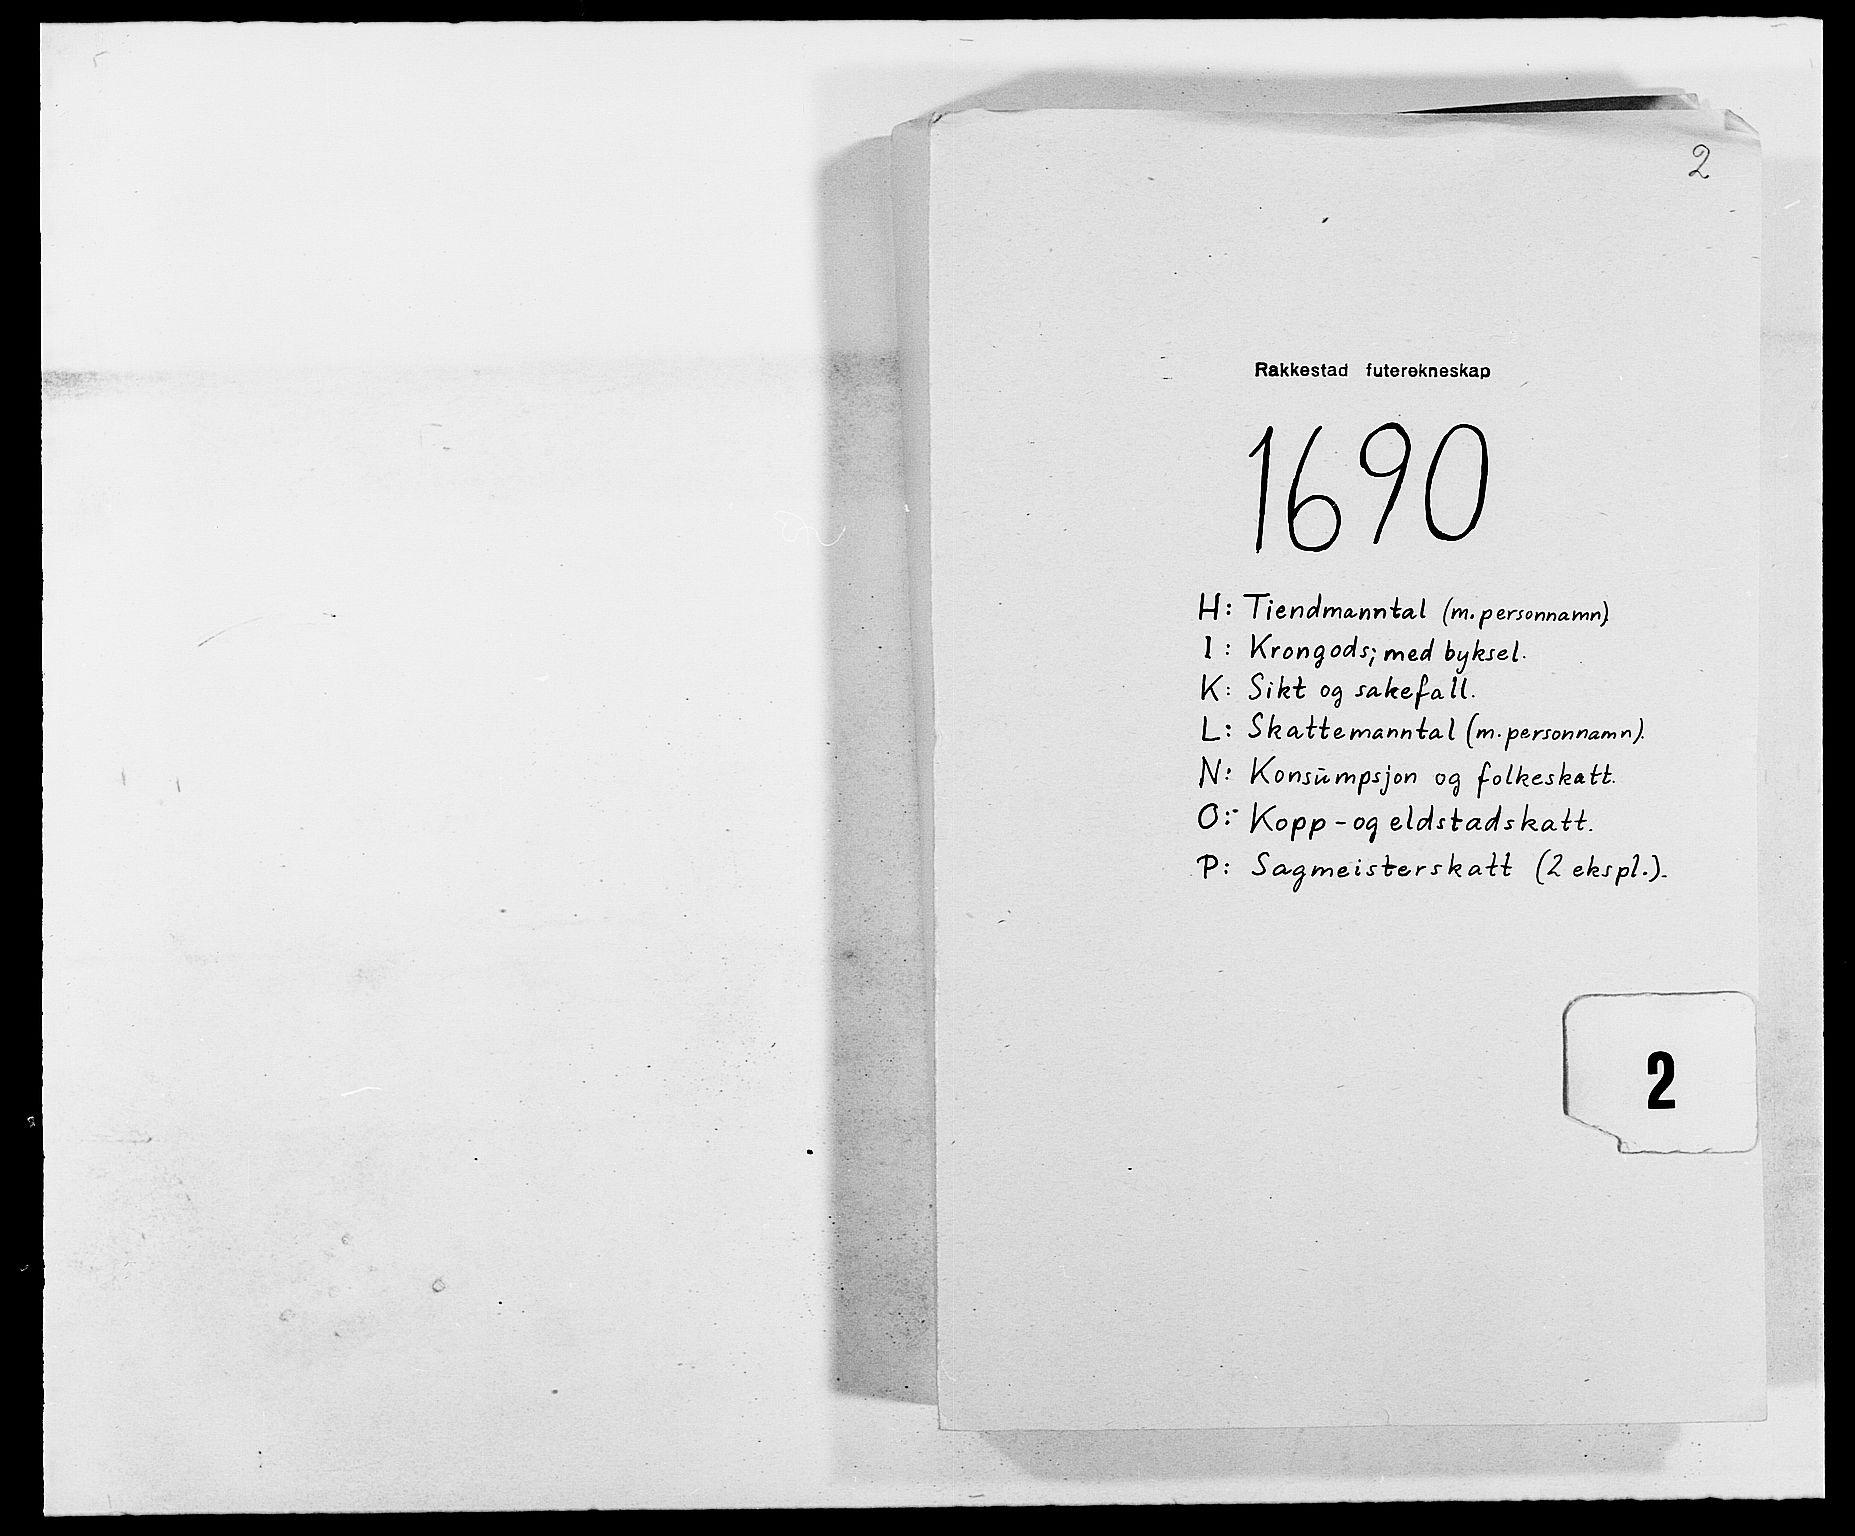 RA, Rentekammeret inntil 1814, Reviderte regnskaper, Fogderegnskap, R05/L0277: Fogderegnskap Rakkestad, 1689-1690, s. 155